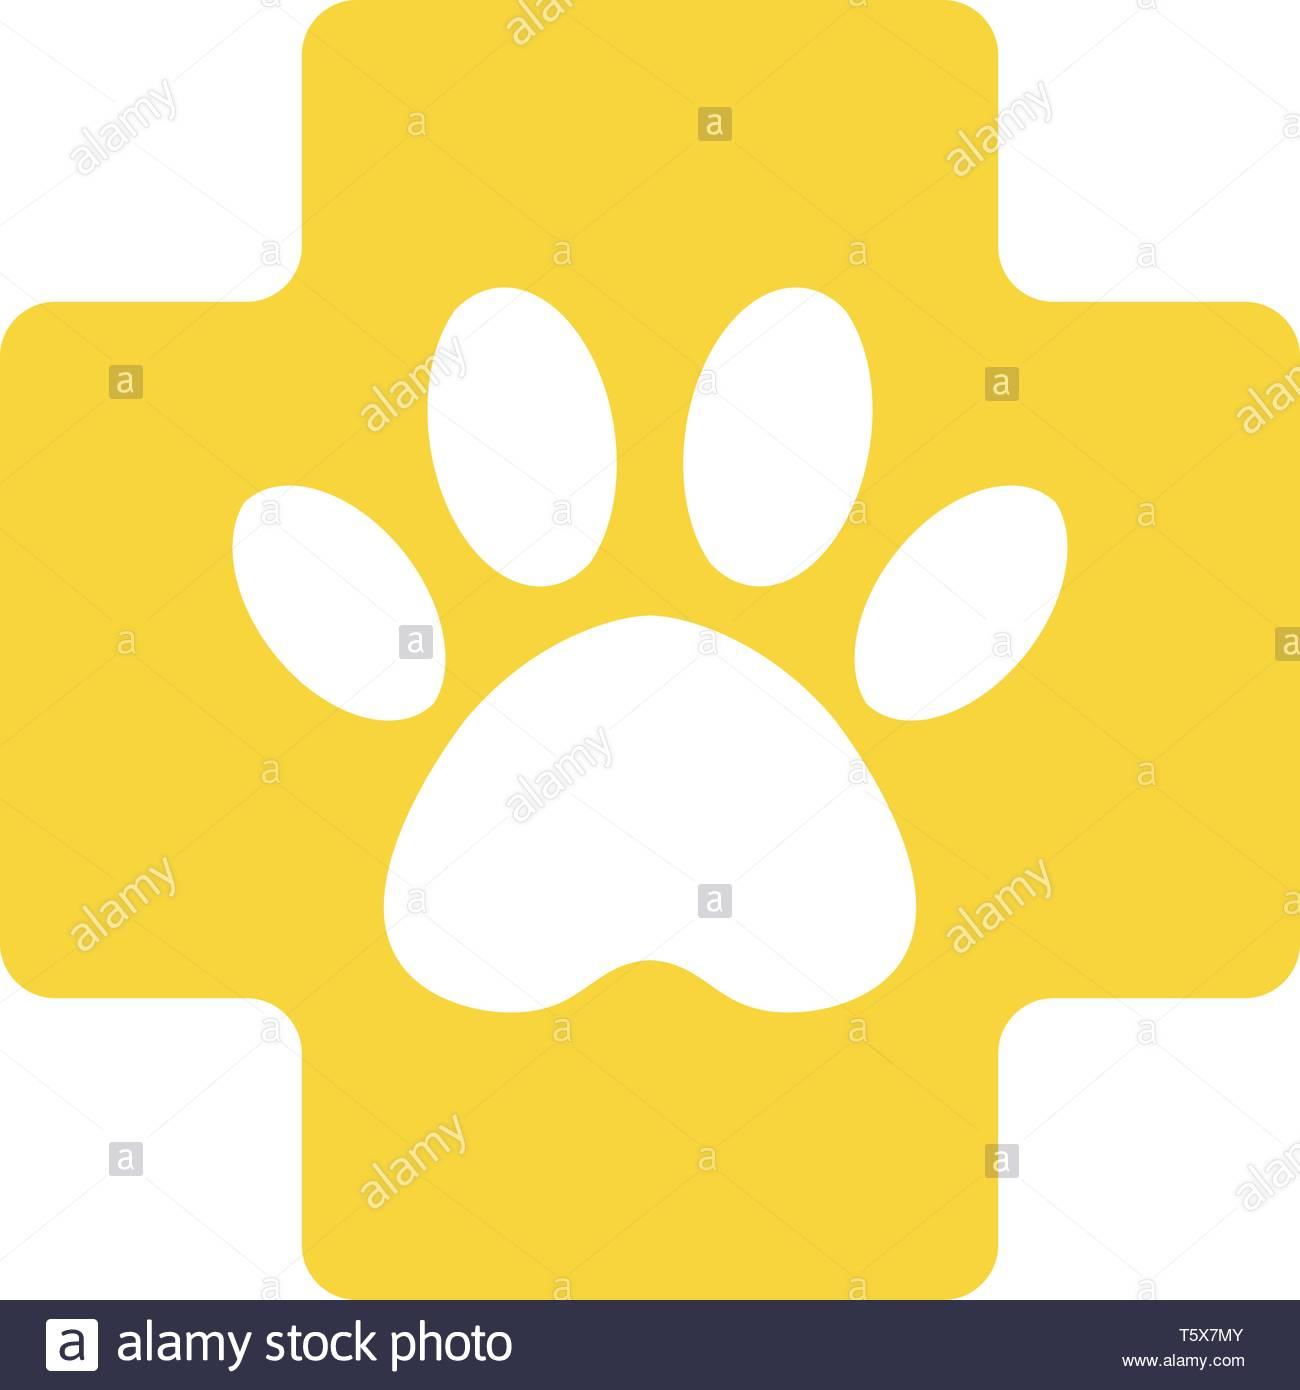 veterinary pharmacy sign. yellow cross with paw veterinary care symbol icon. - Stock Image